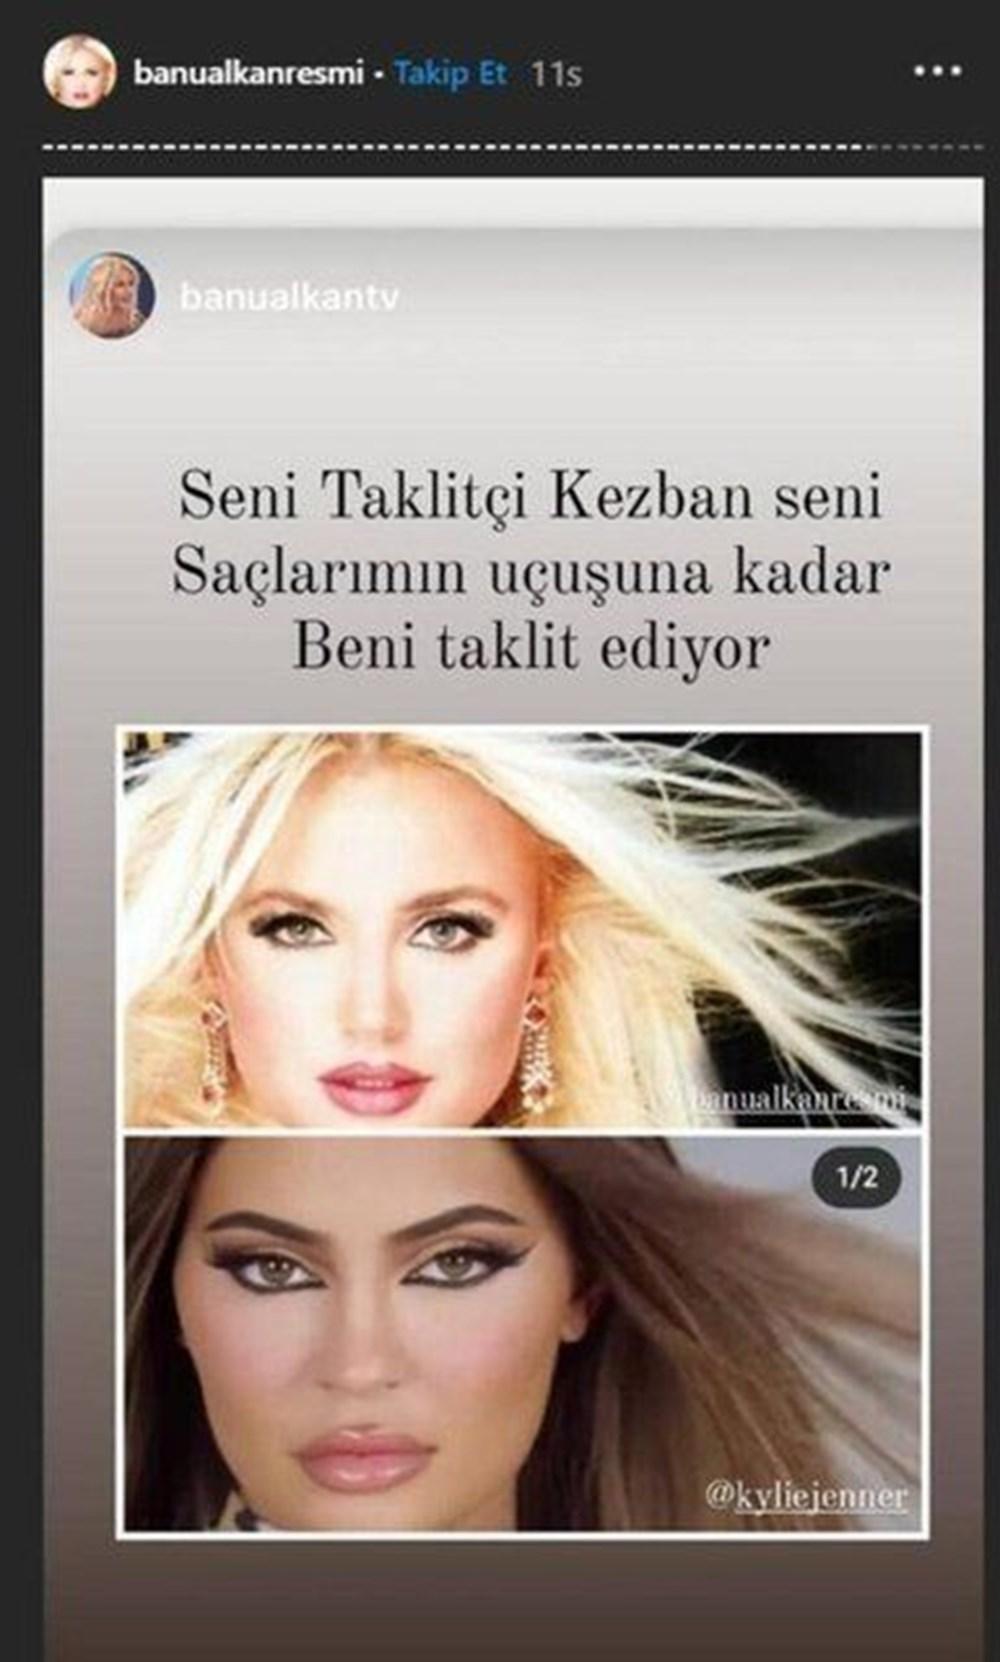 Bu hikayede bir gariplik var: Kylie Jenner'dan Banu Alkan'a mesaj - 2